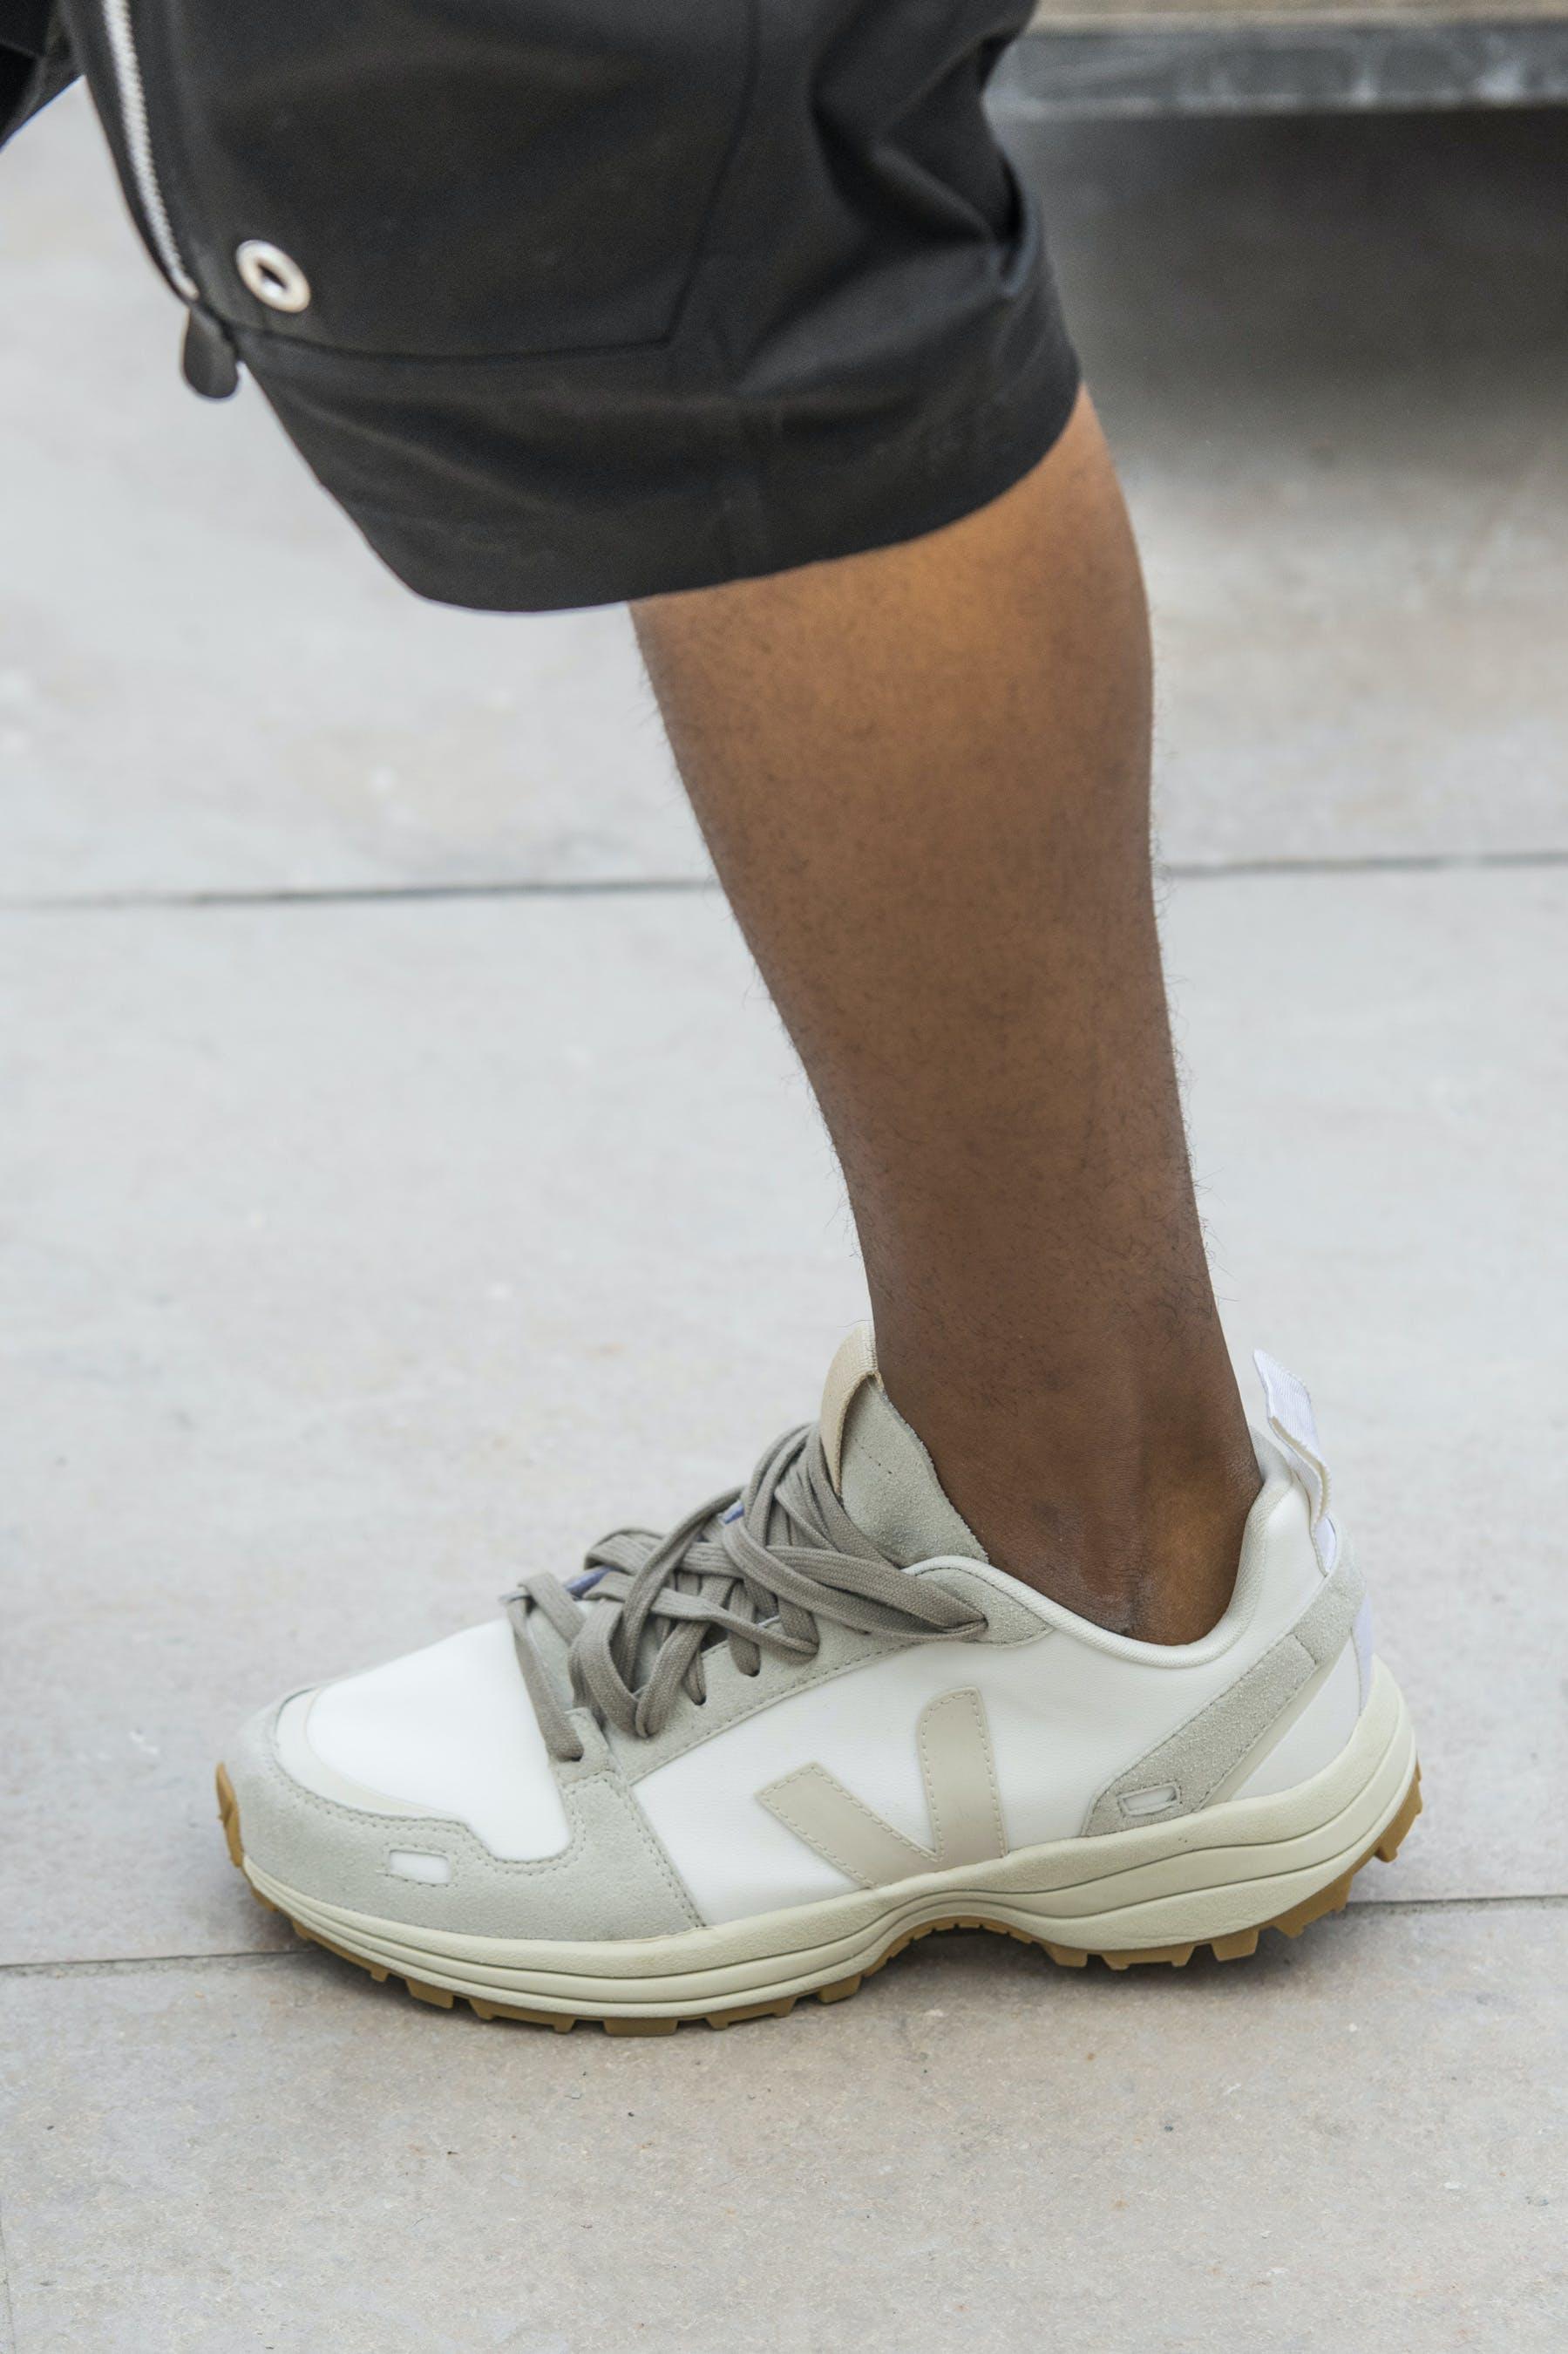 Rick Owens Runway Details Veja Collaboration Hiking Shoe In Pearl Mens SS20 Tecautl